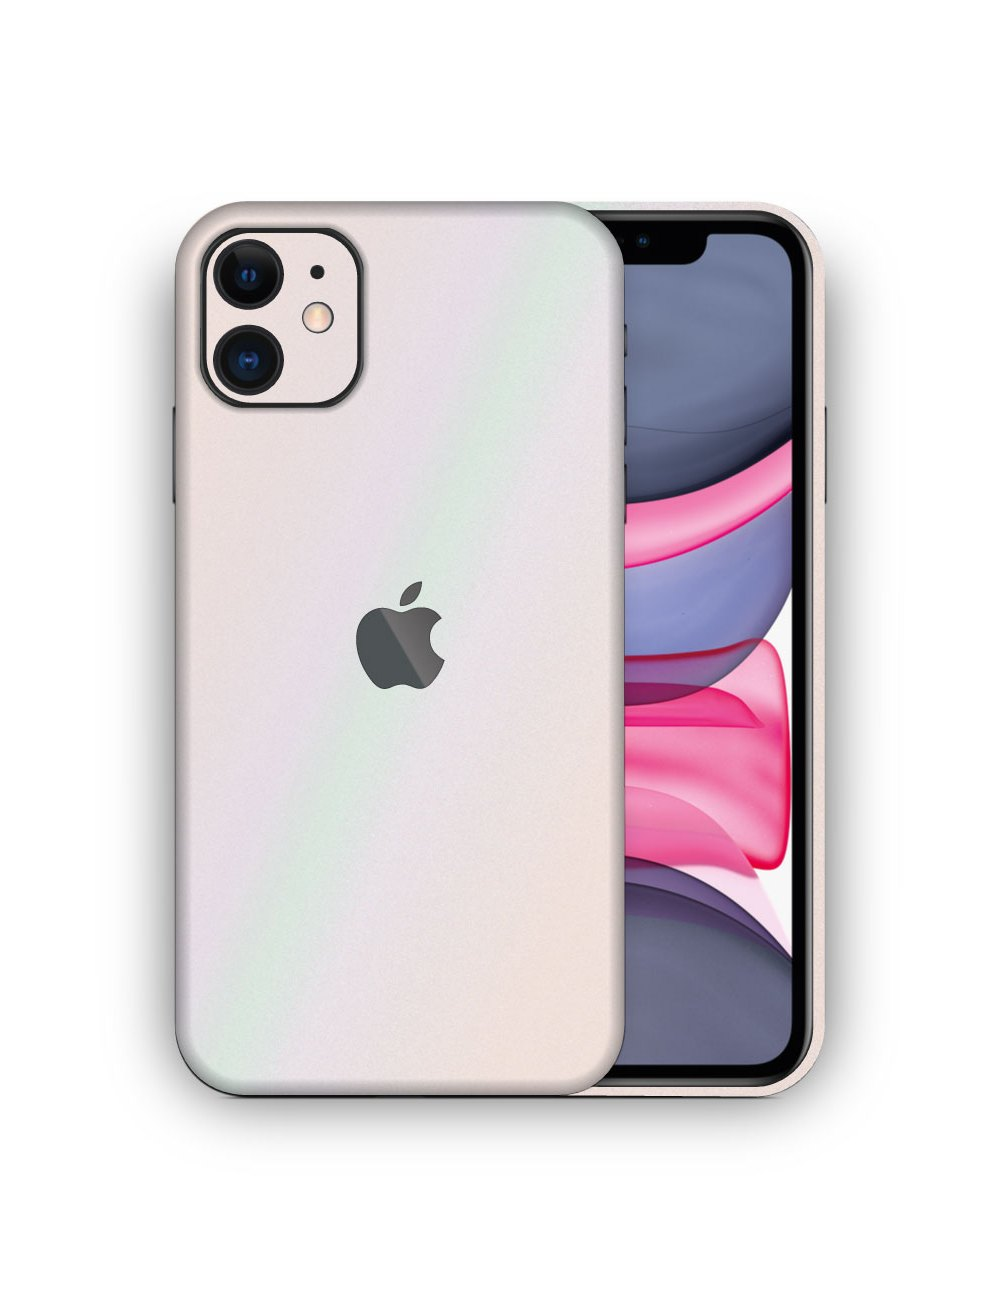 Apple iPhone 11 Metallic Pearl Vinyl Skin Wrap